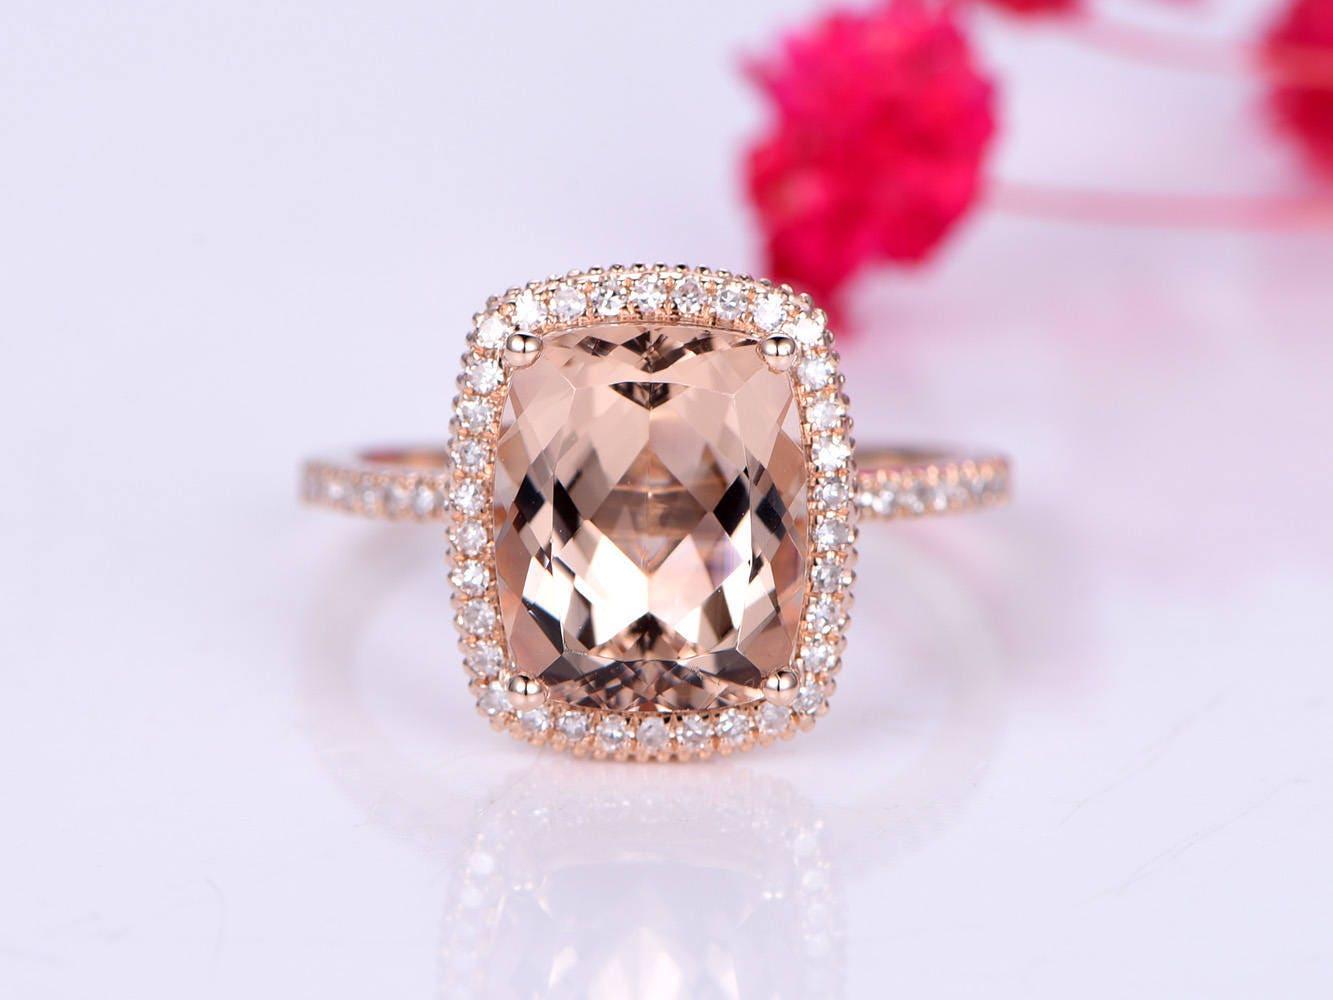 Morganite engagement ring pink morganite ring big cushion | Etsy